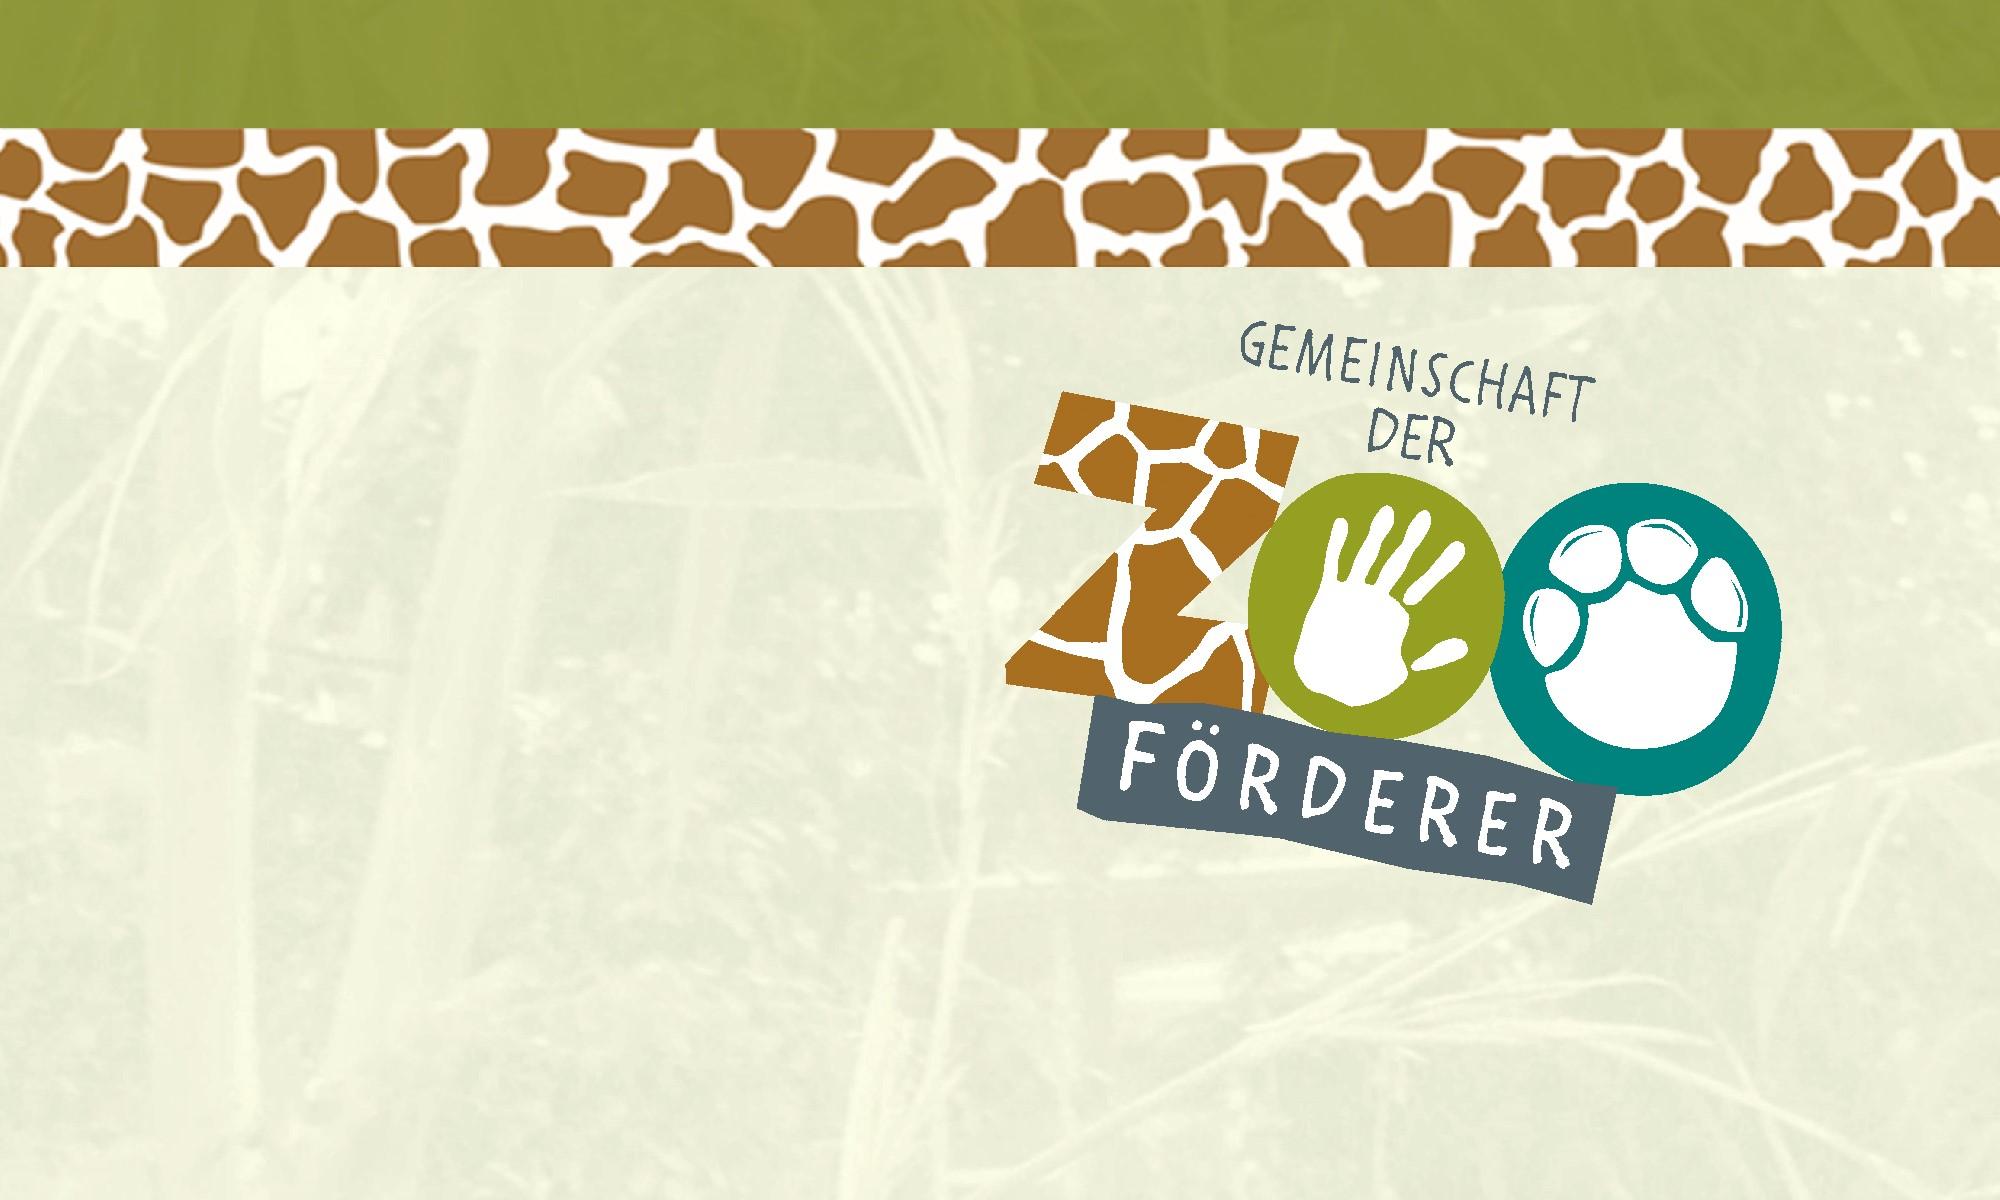 Gemeinschaft Deutscher Zooförderer e.V.